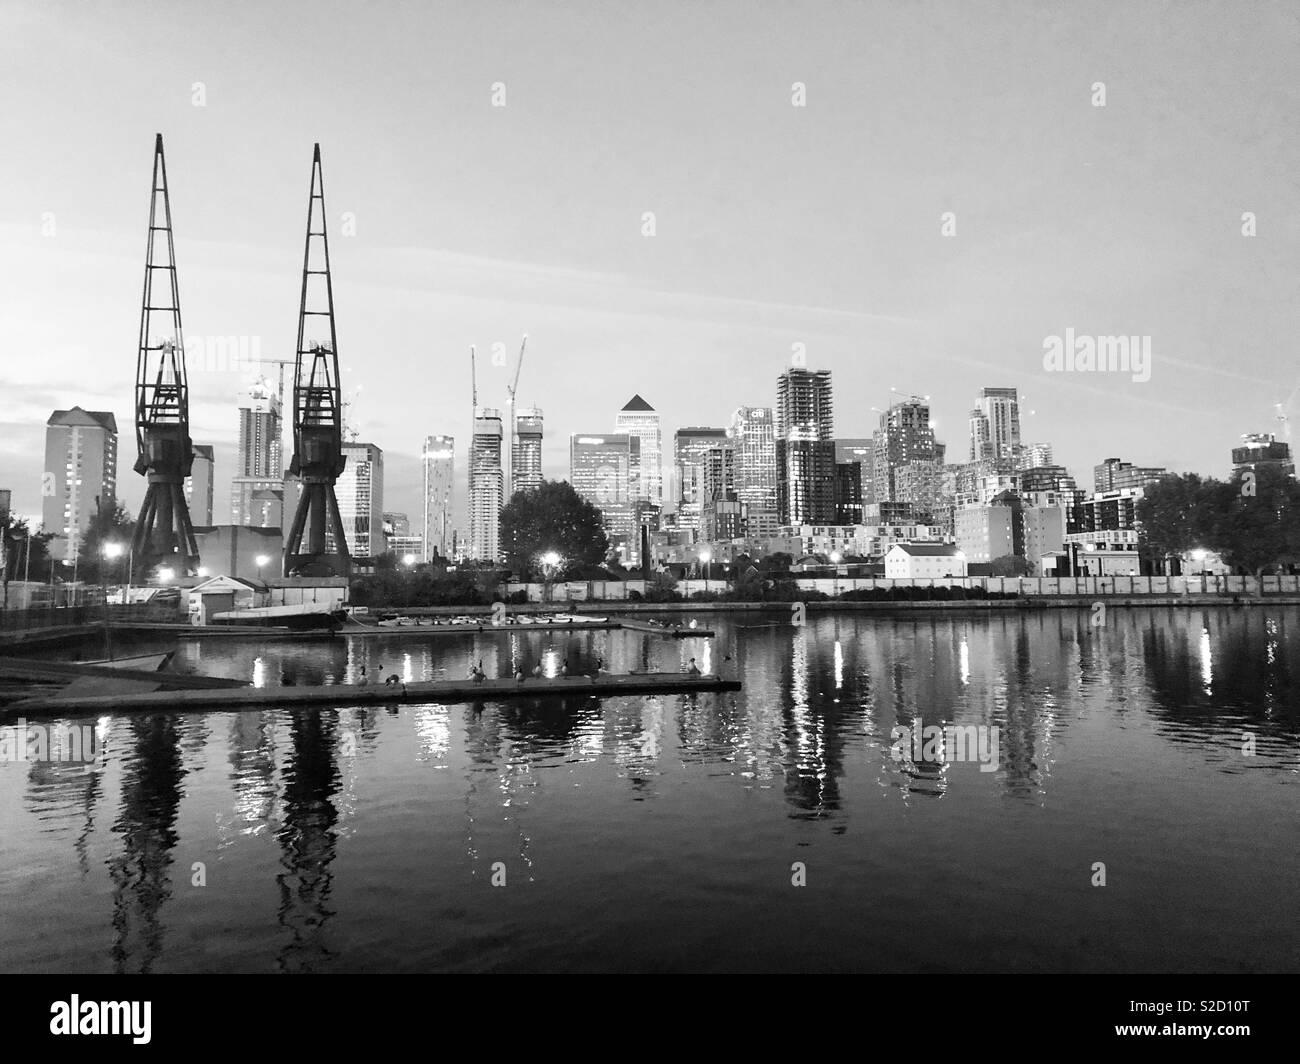 Millwall Dock, London - Stock Image